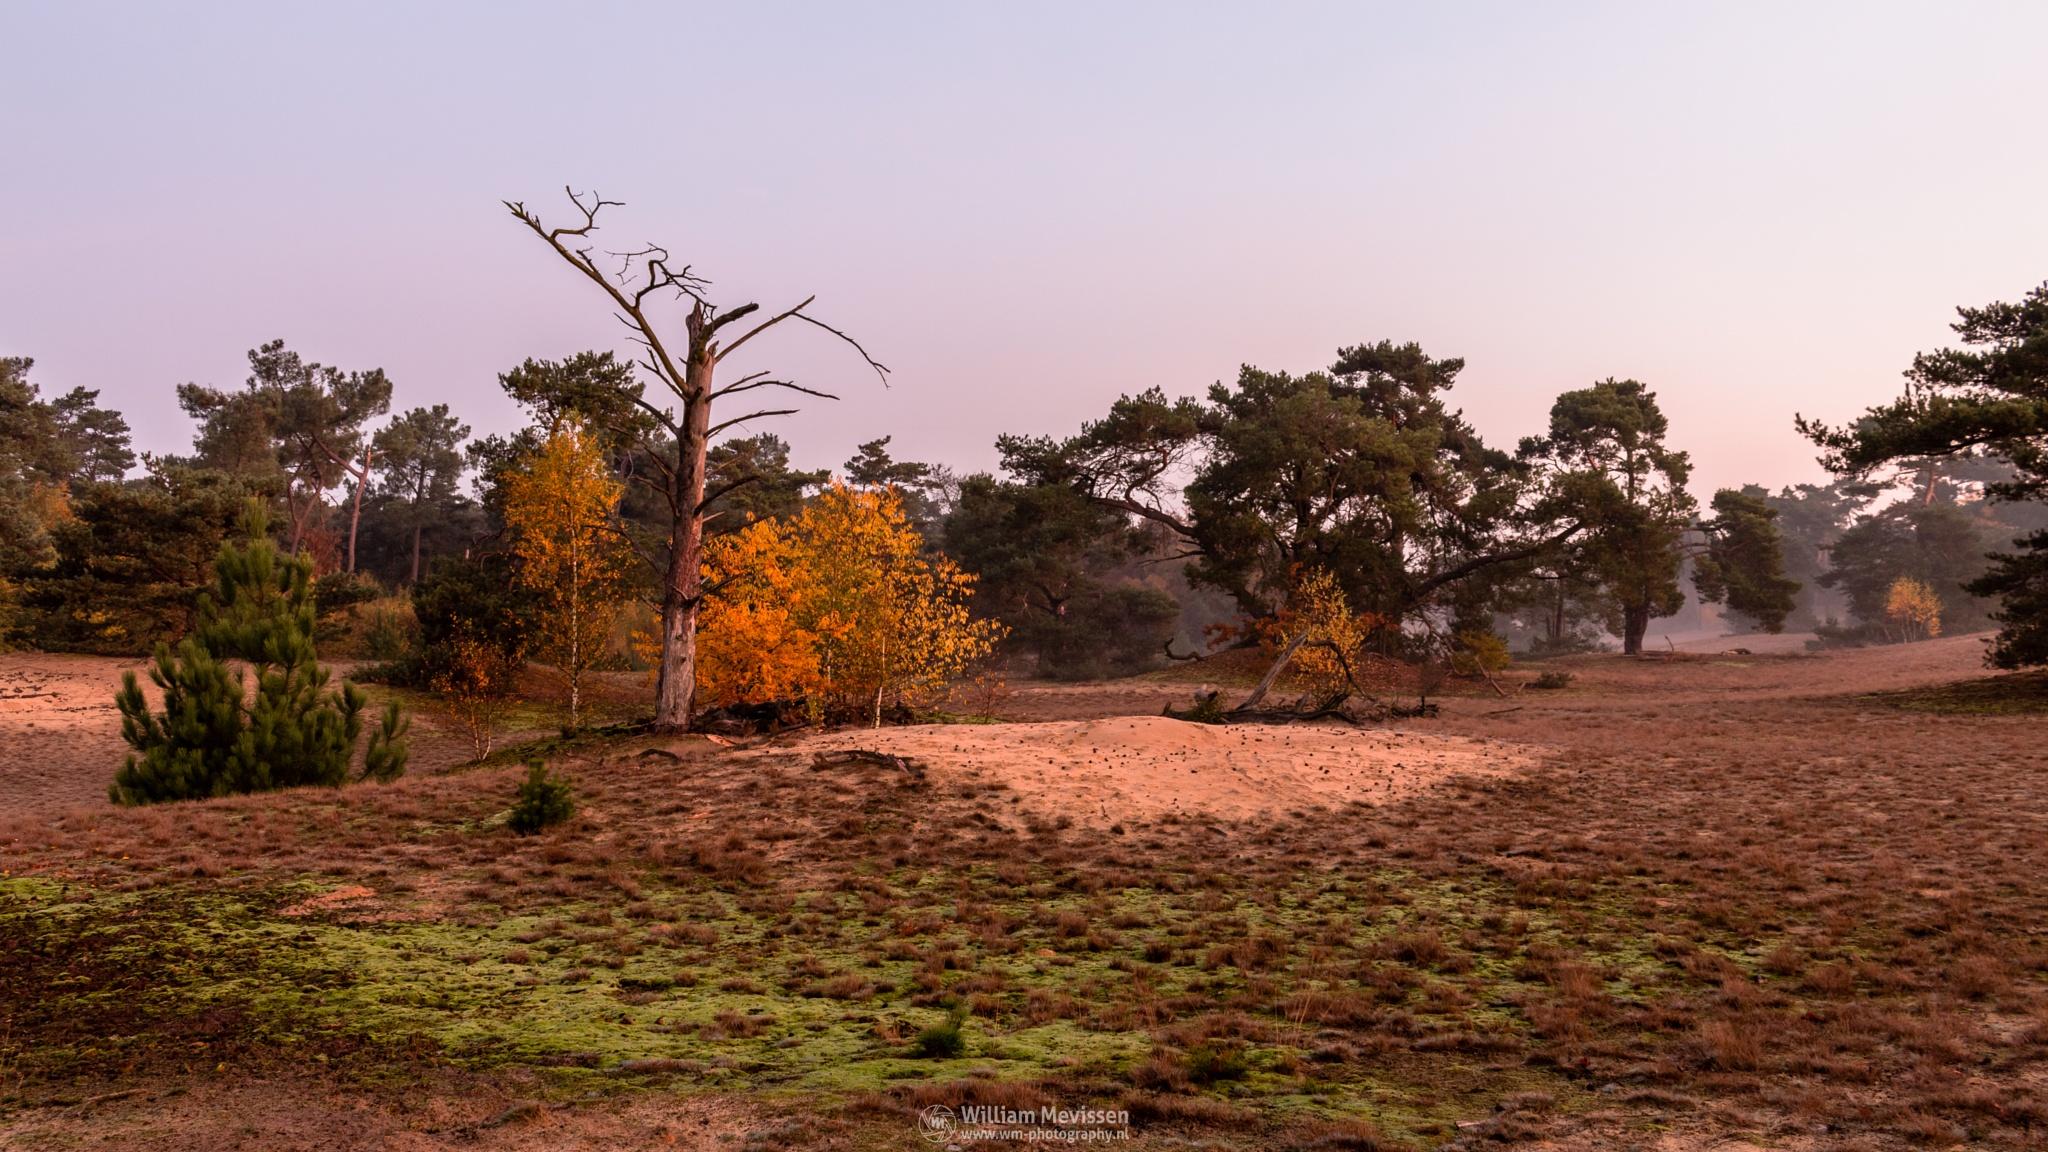 Autumn Twilight by William Mevissen